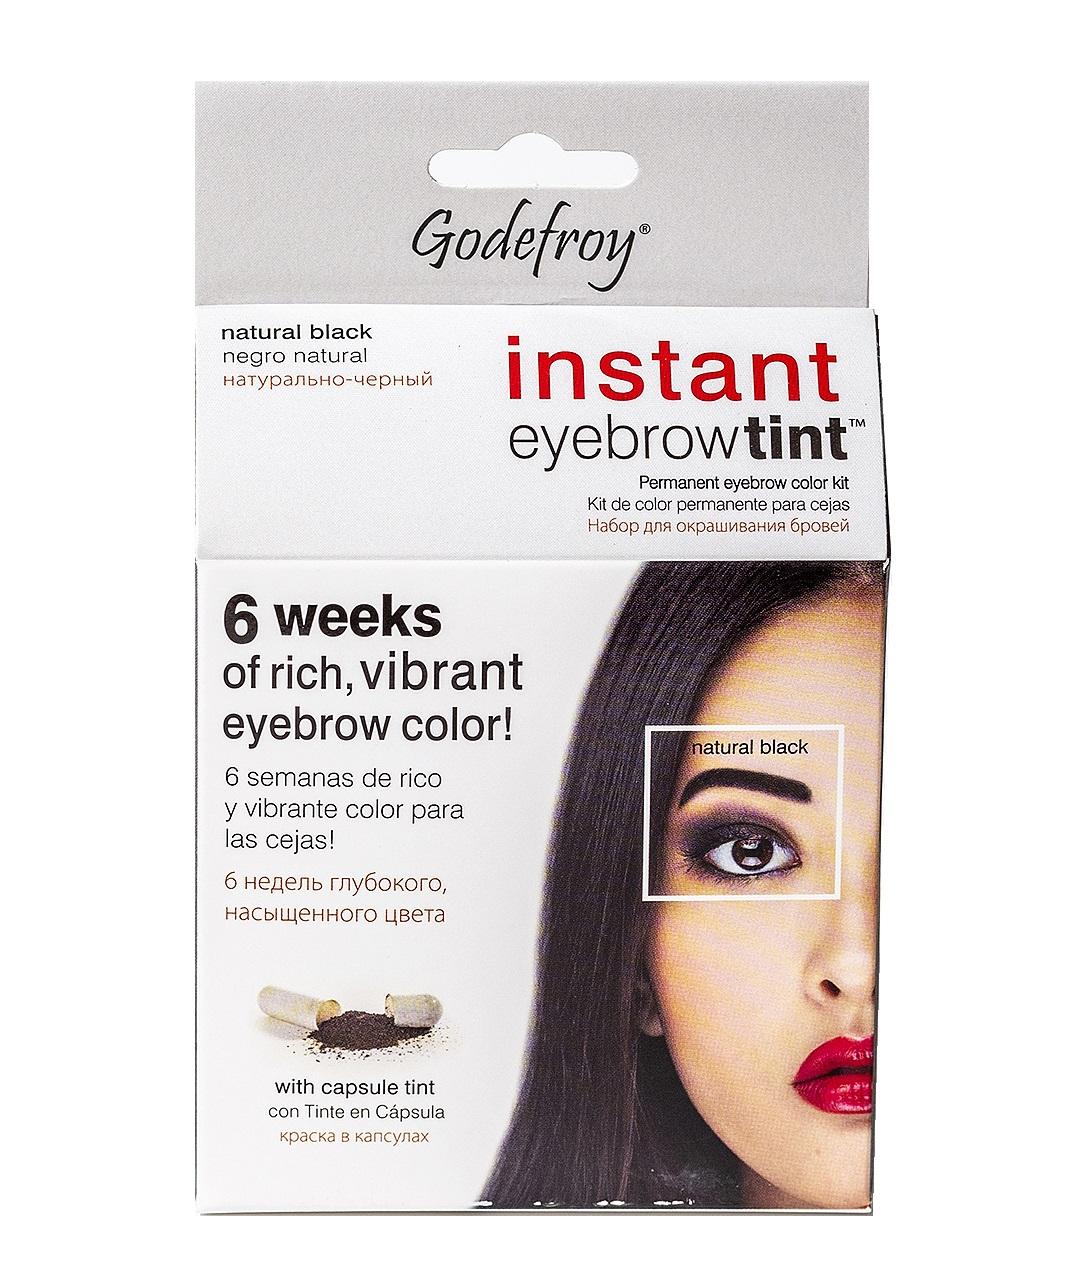 GODEFROY Краска-хна в капсулах для ресниц и бровей, набор (черная) 15 шт/ Godefroy Eyebrow Tint Natural Black